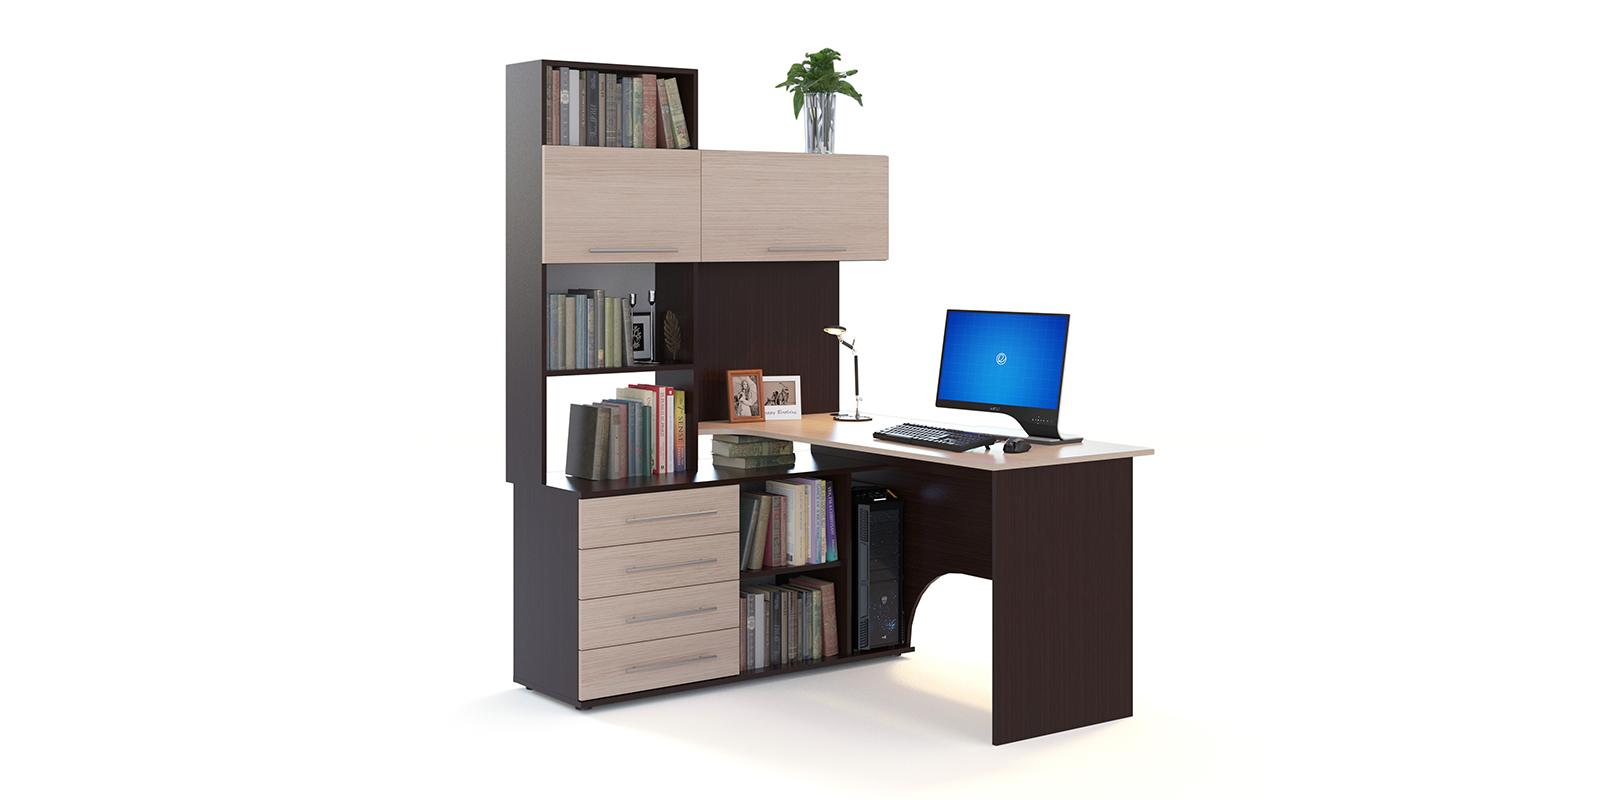 Стол компьютерный HomeMe Мерида AFU0083000